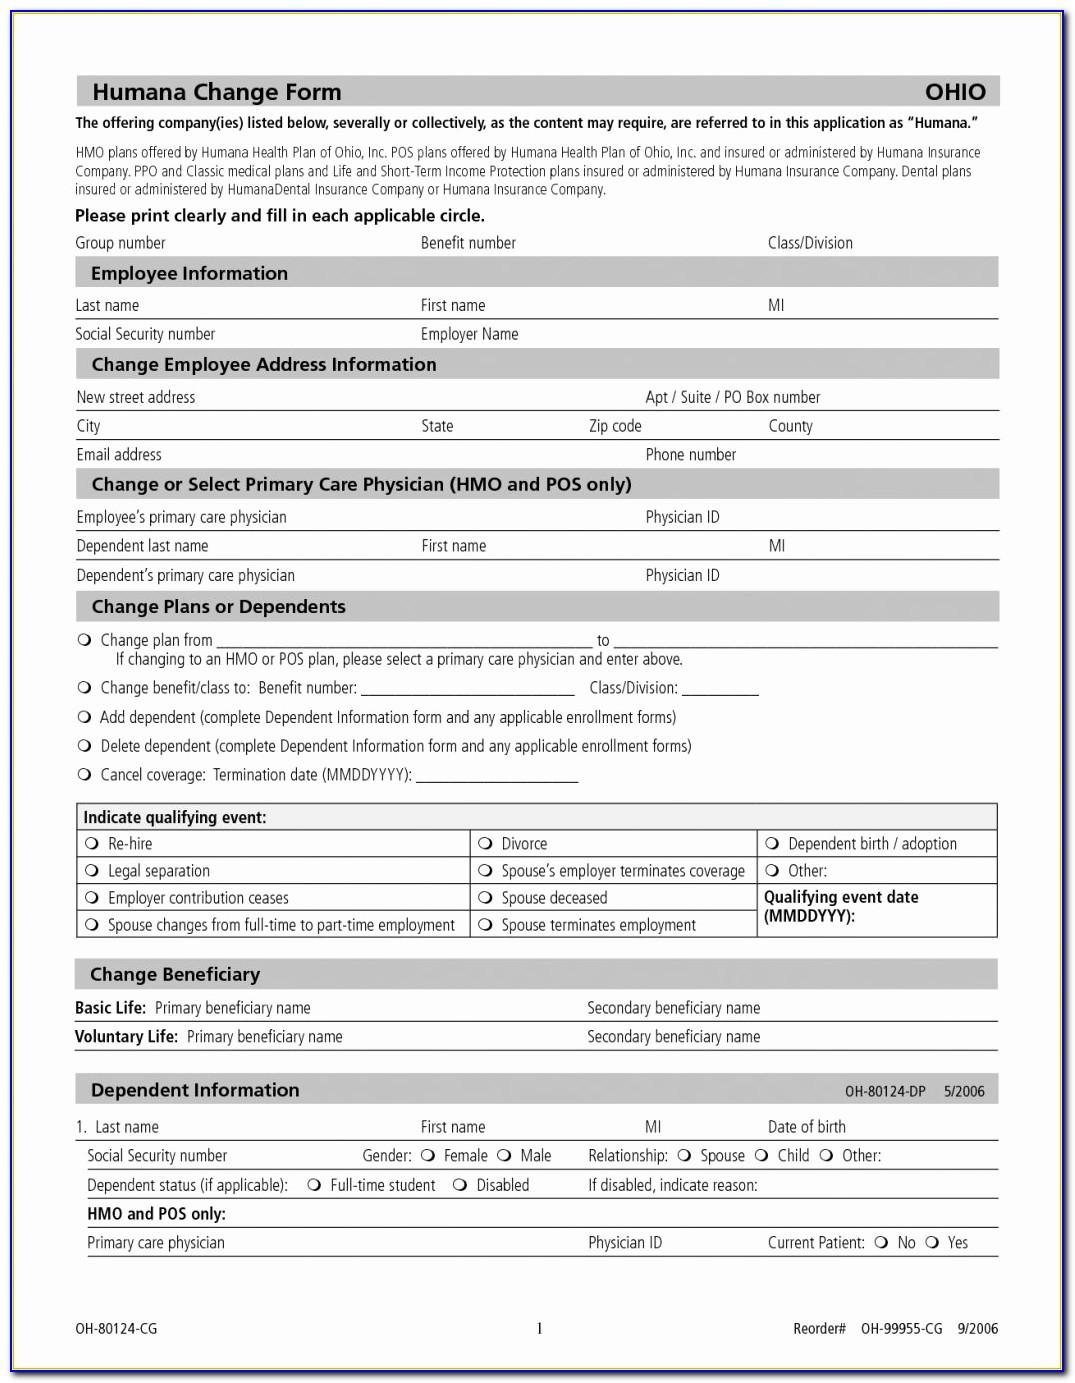 Humana Prior Authorization Form Elegant Humana Prior Authorization Form Business Templates Request For